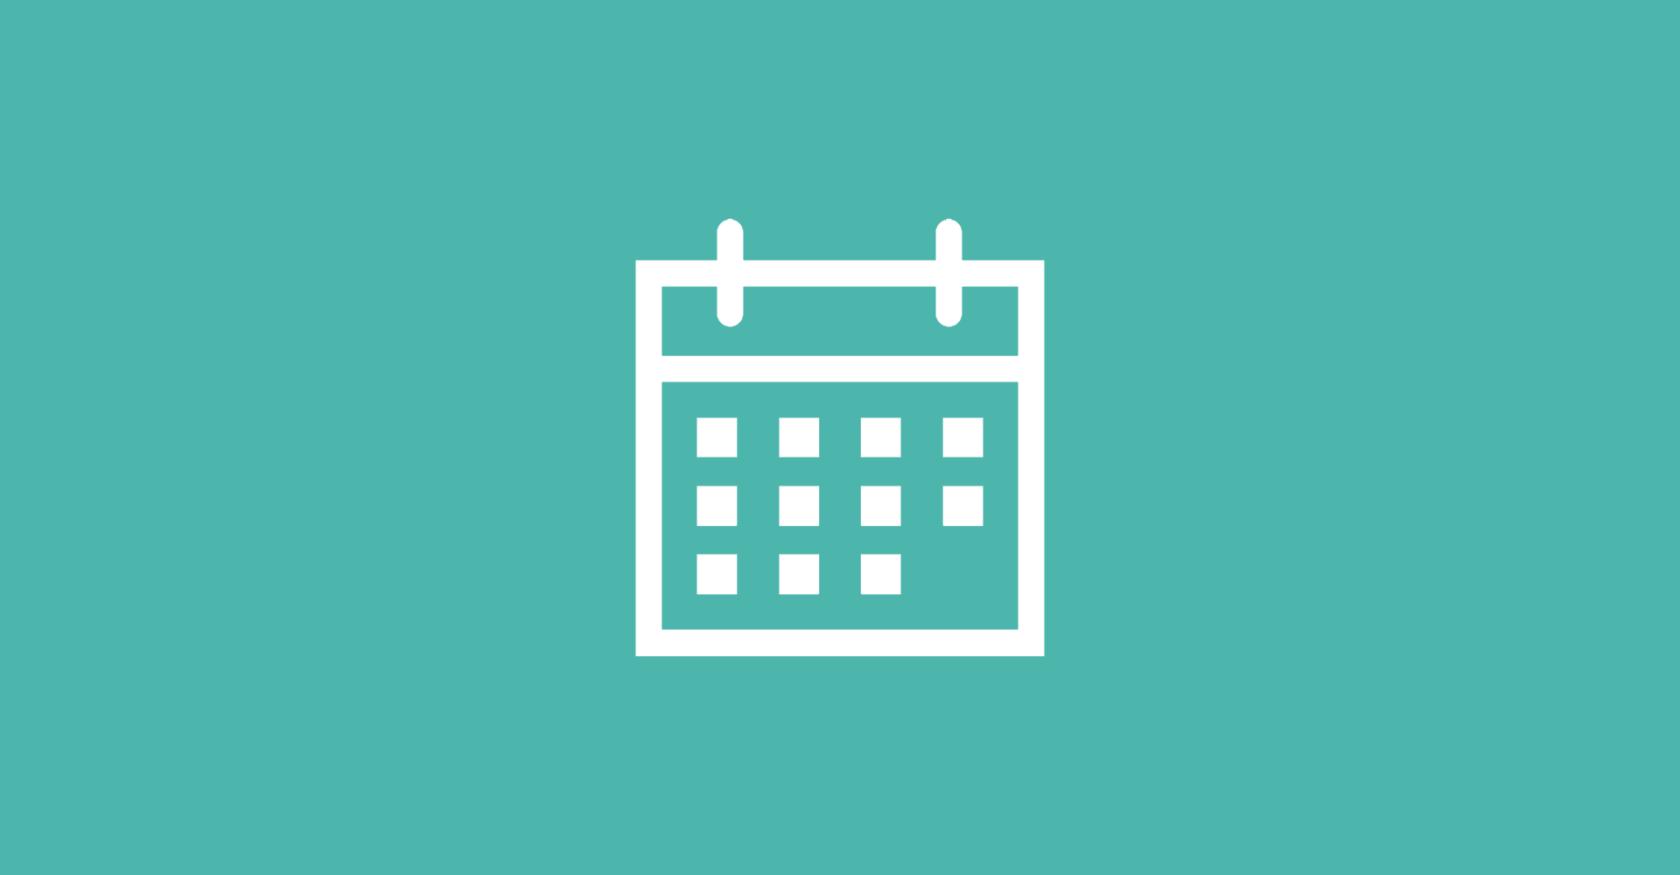 Event-Tipp: Expert Day for Xamarin presents .NET MAUI